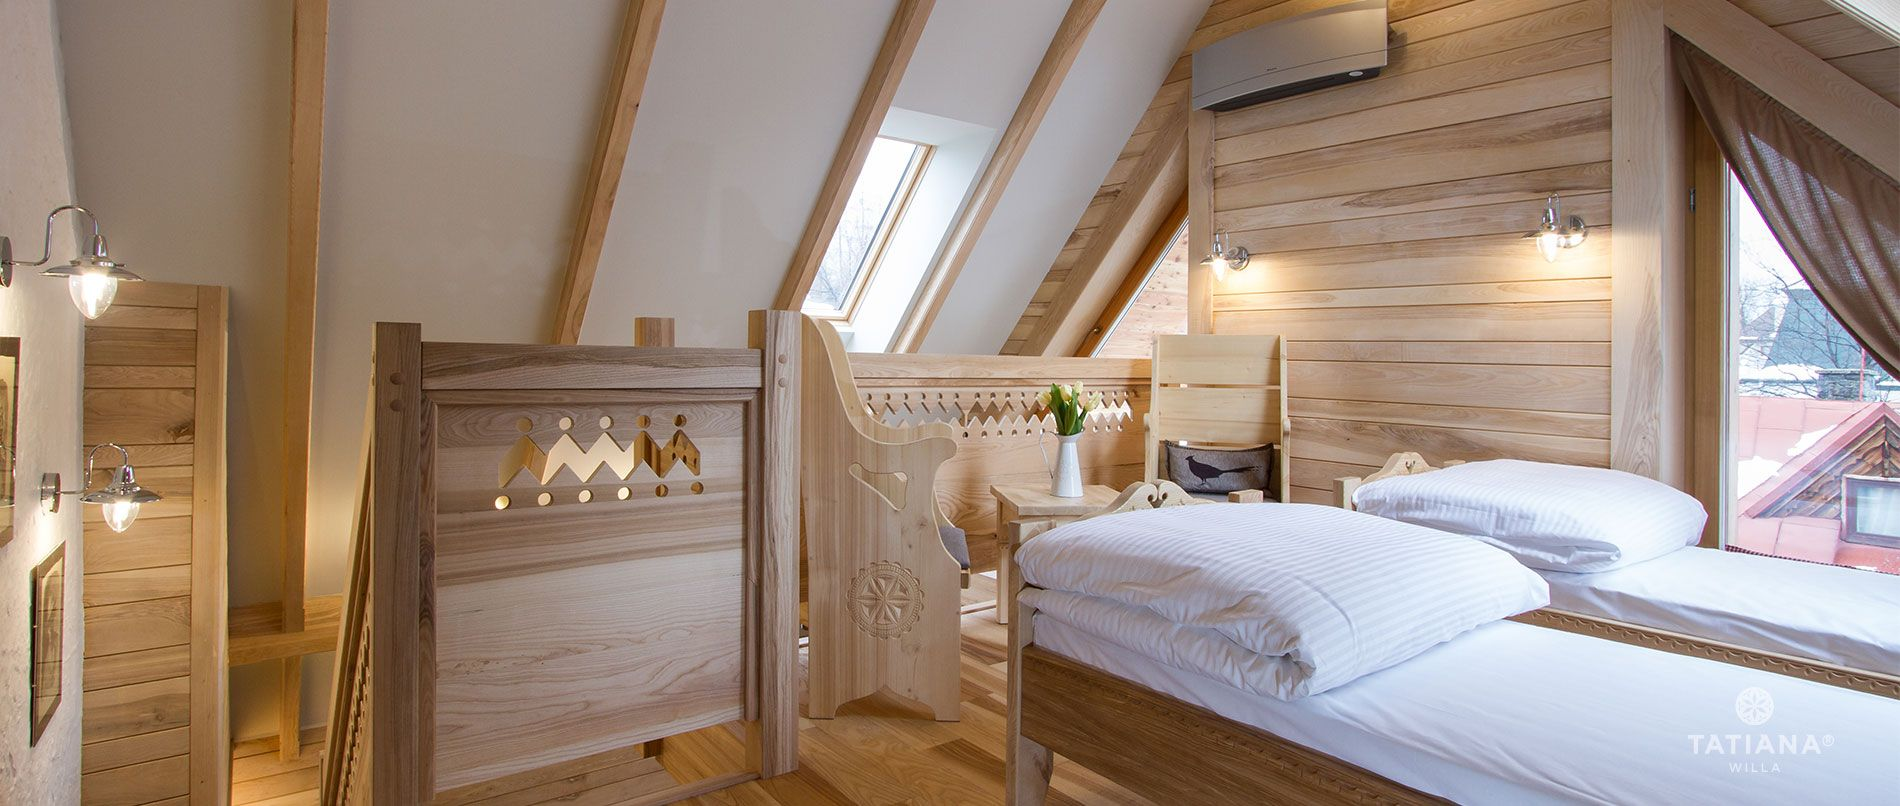 Apartament Jesionowy- druga sypialnia